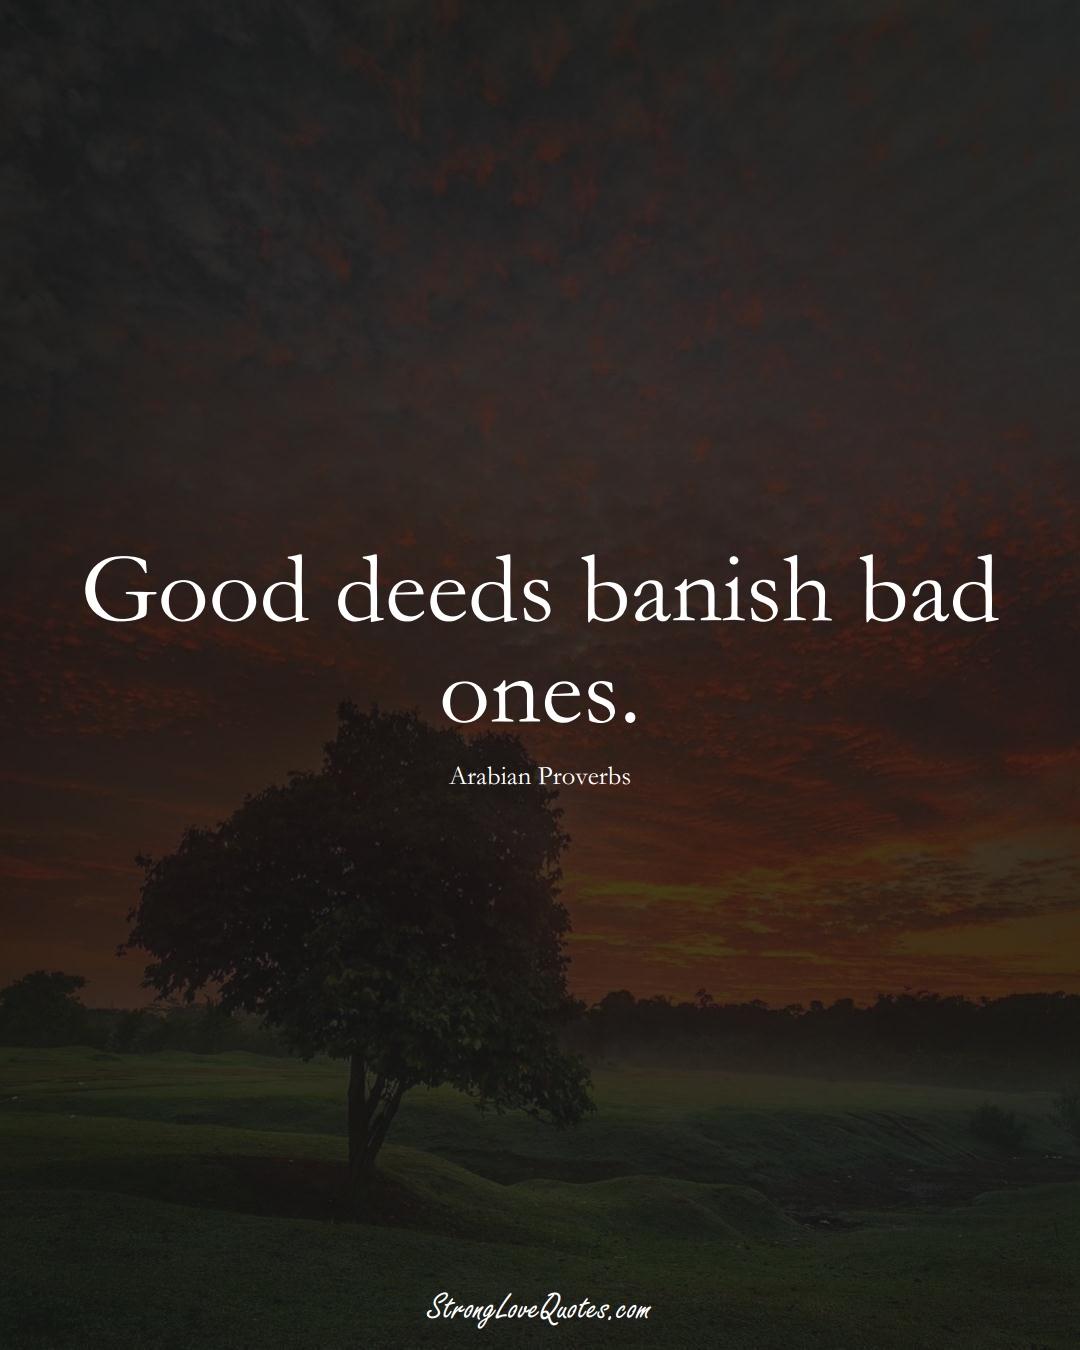 Good deeds banish bad ones. (Arabian Sayings);  #aVarietyofCulturesSayings